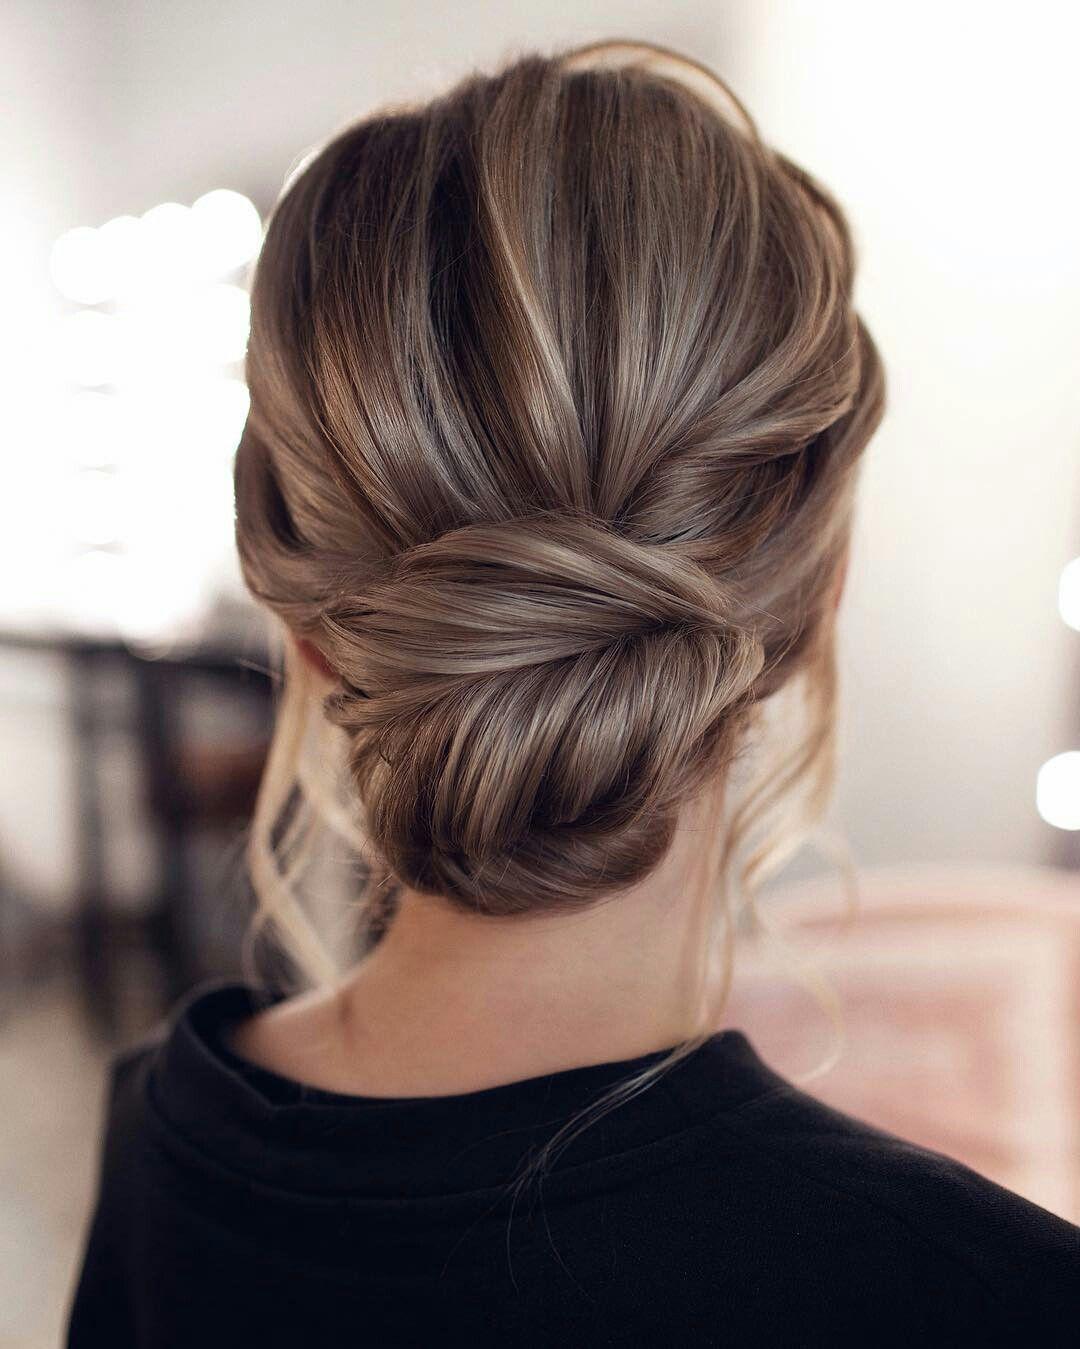 Pin by caitlin sheard on hair and beauty in pinterest hair